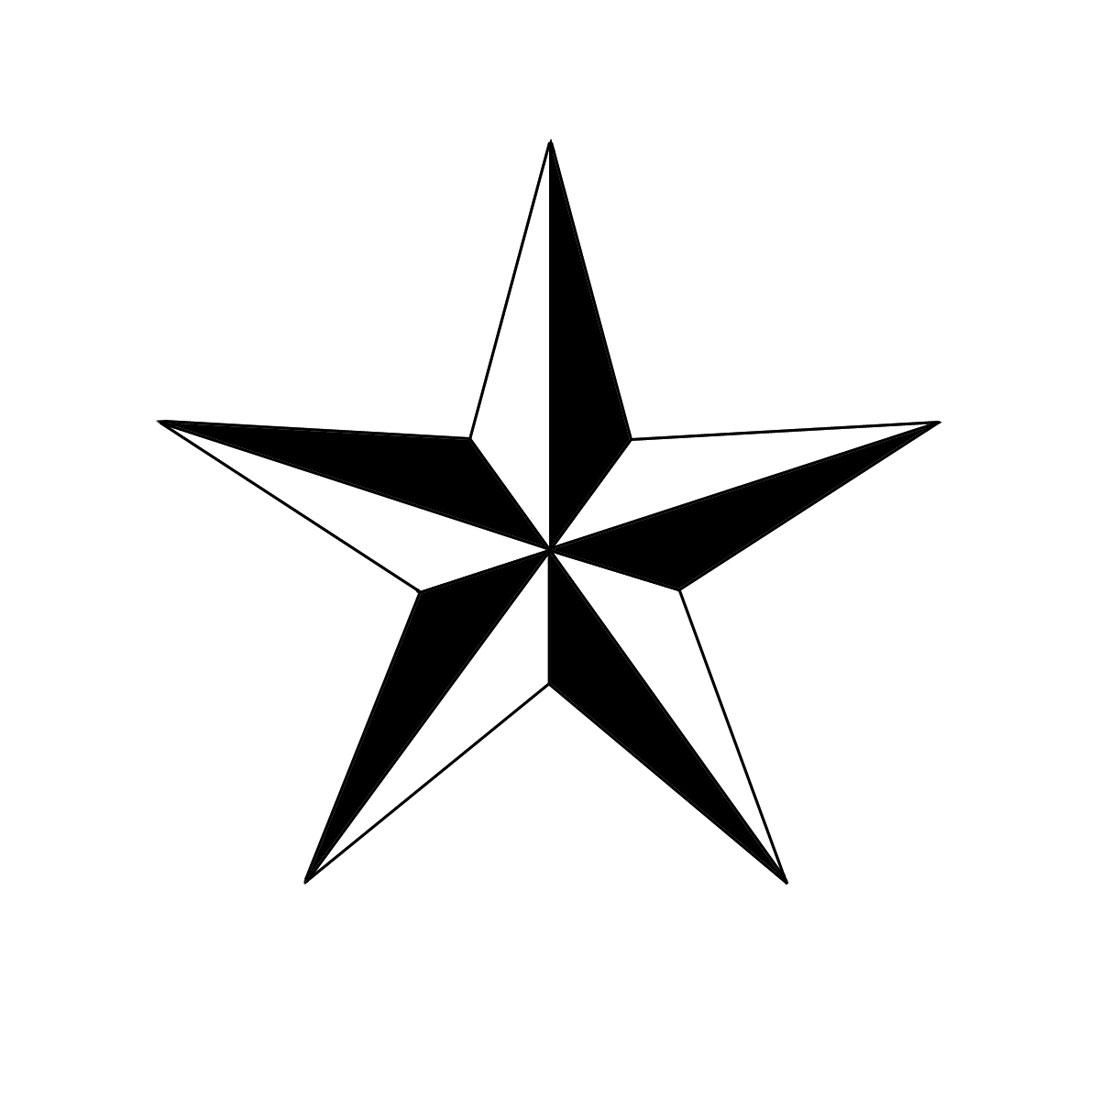 1100x1100 How To Draw A Nautical Star Steps